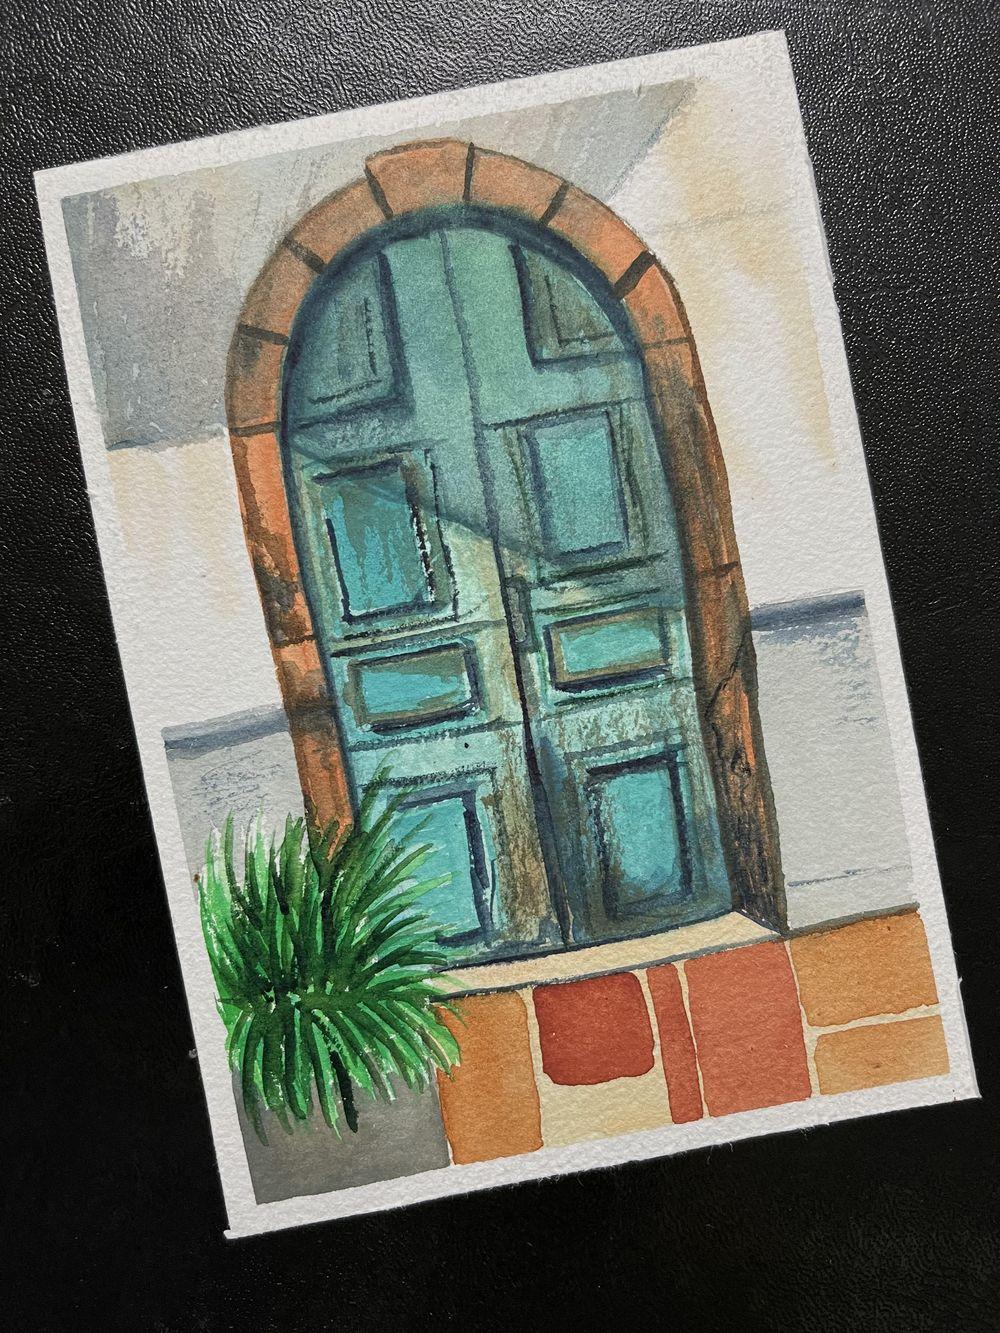 Watercolor postcards: Vinita - image 3 - student project